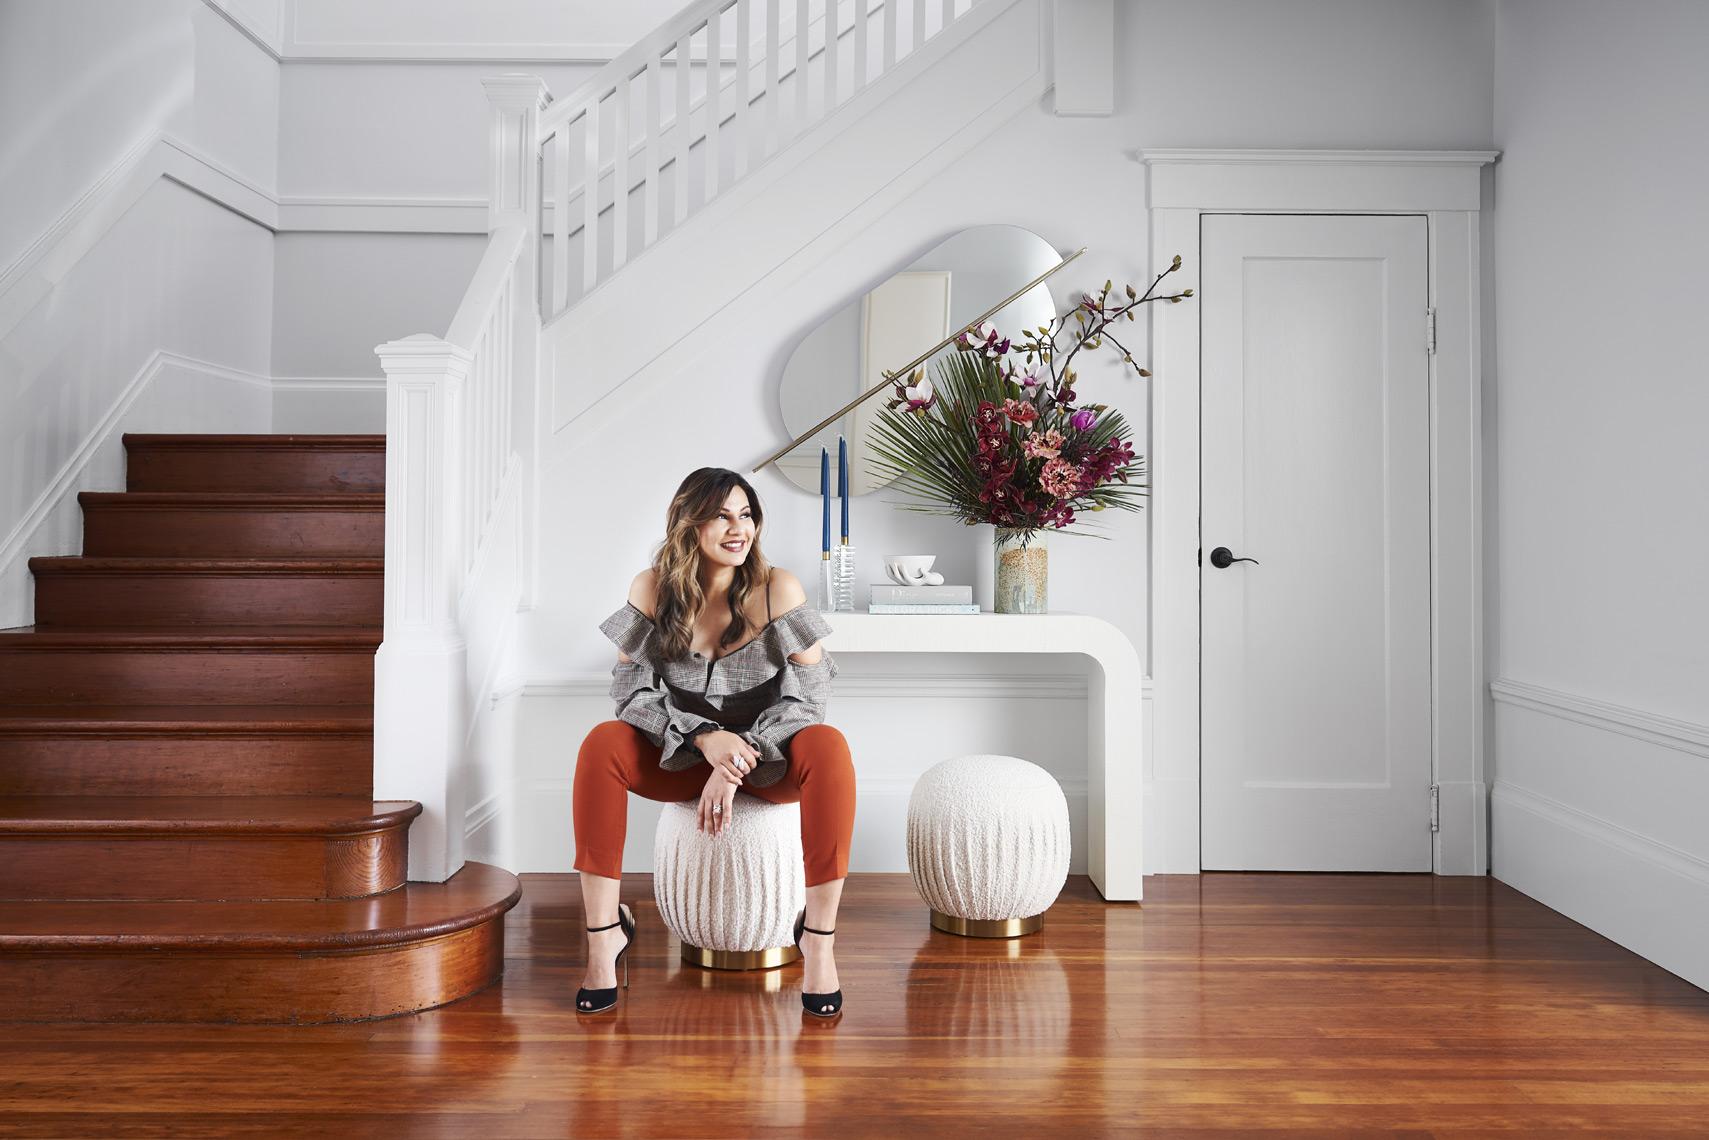 rterior-studio-los-angeles-ca-edwardian-beauty-designer-in-entryway-of home